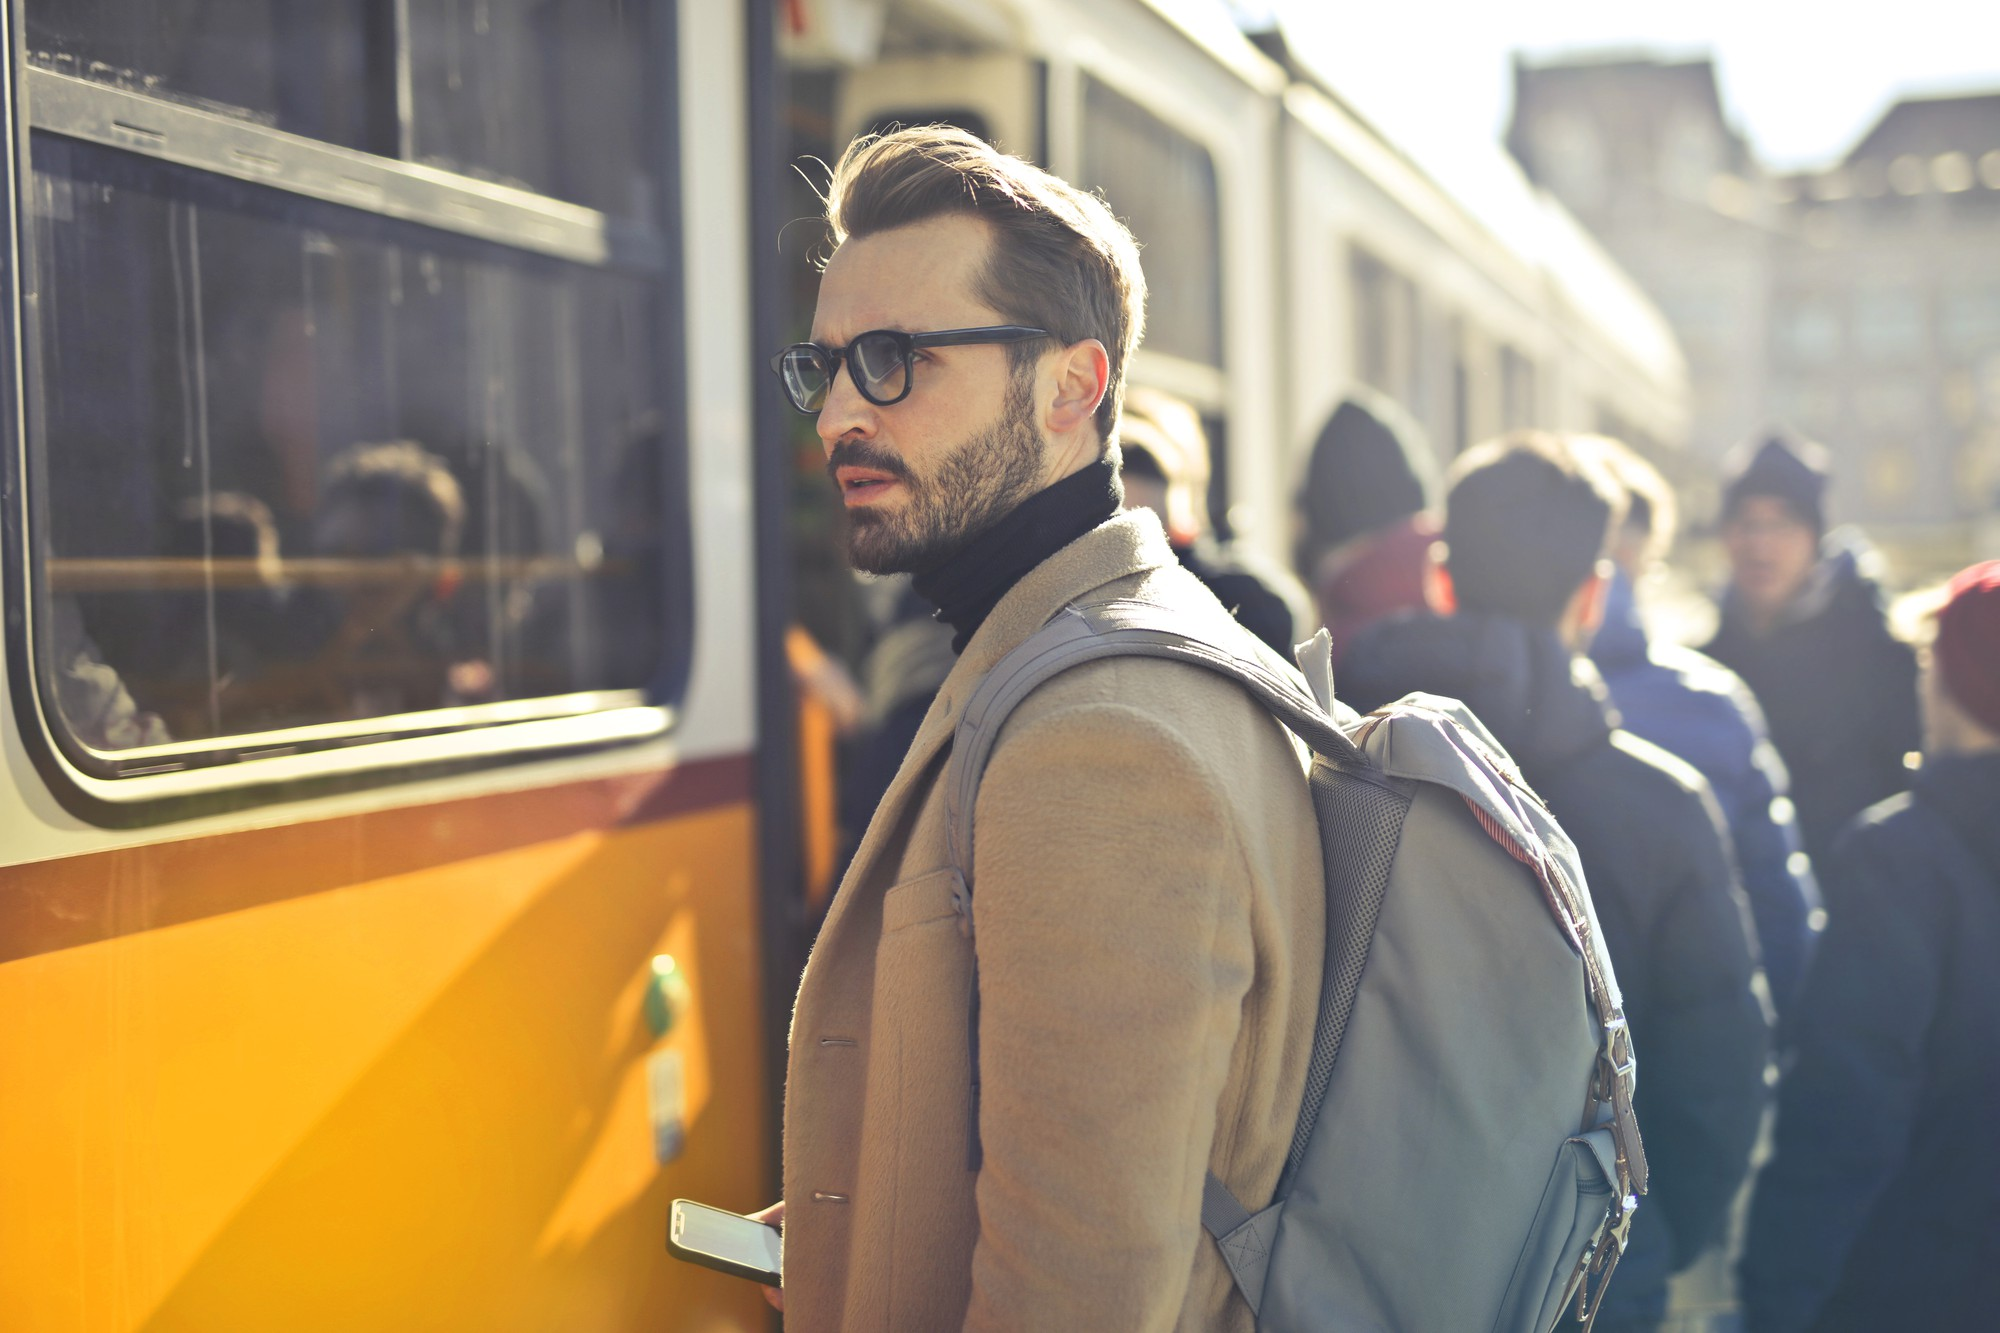 backpack-beard-city-837358-1523246372119525679831.jpg